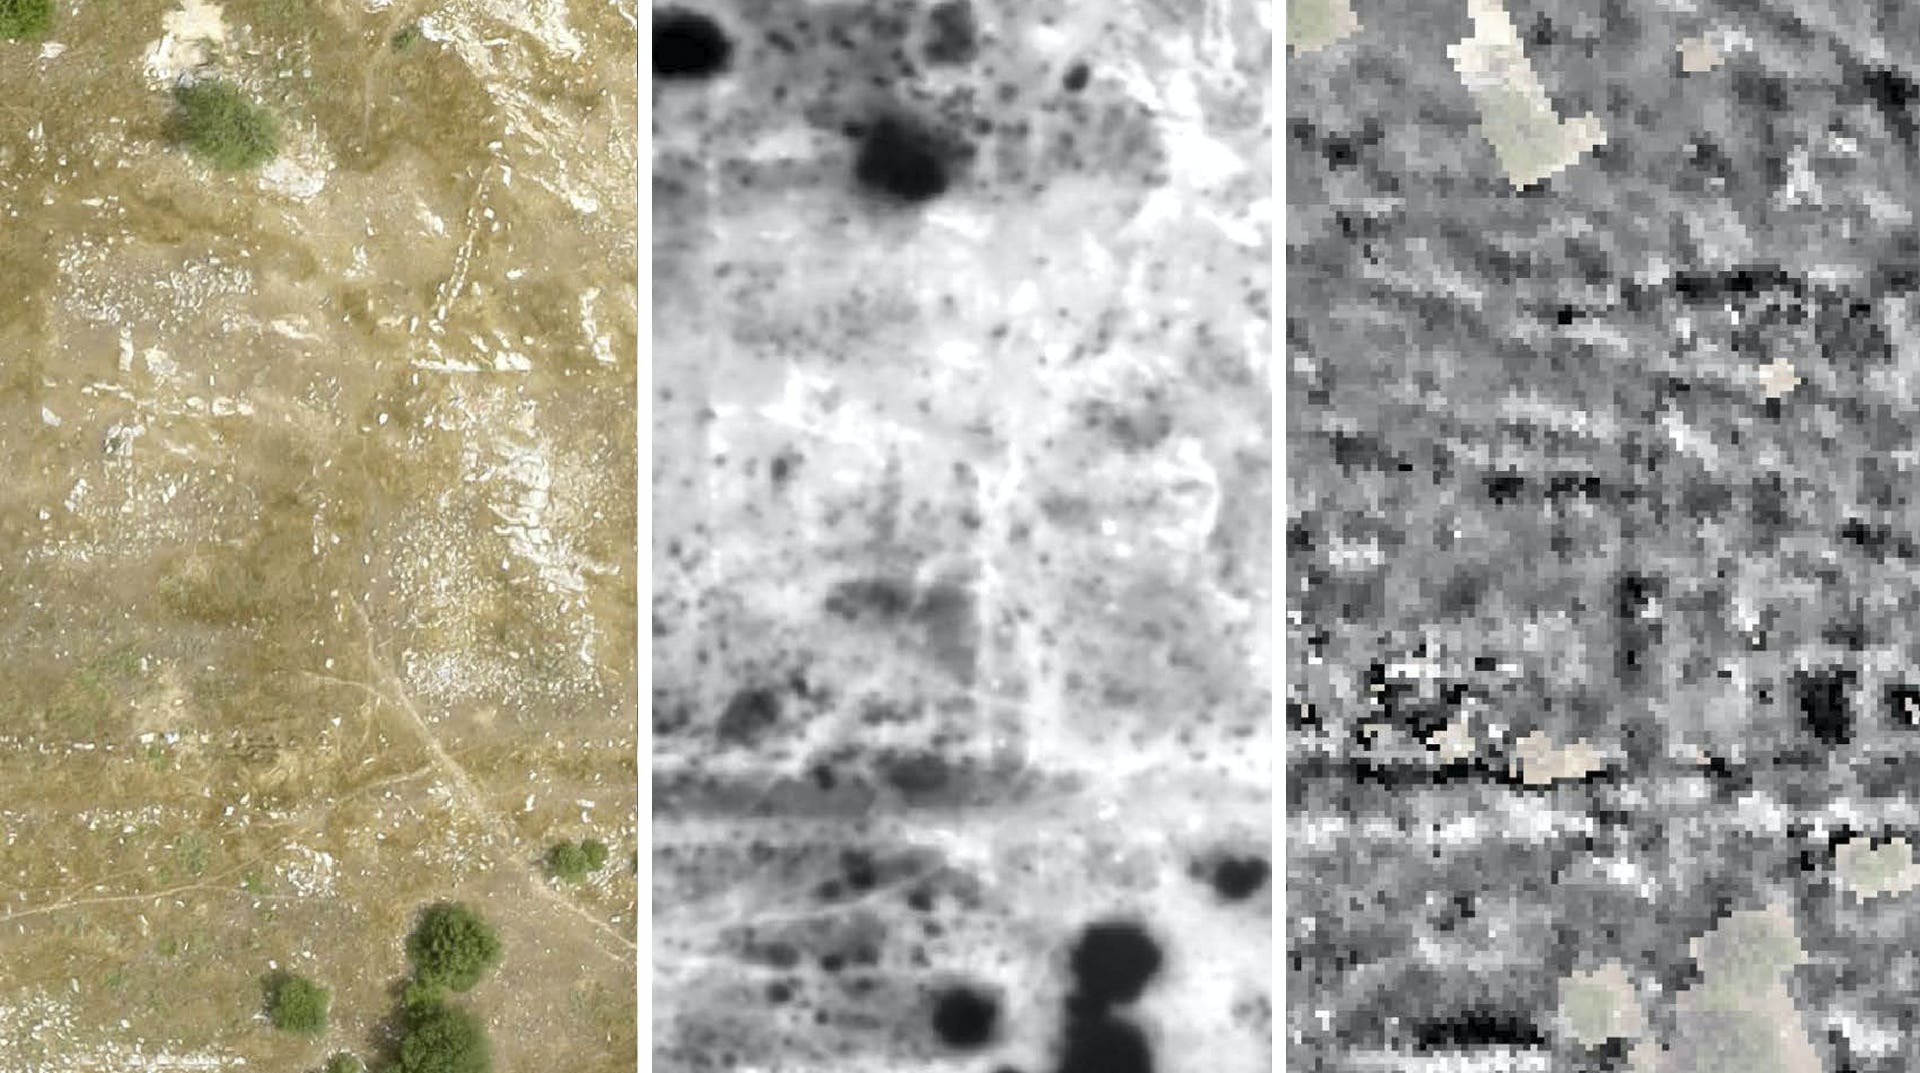 Rvtr notion survey triptych imaging